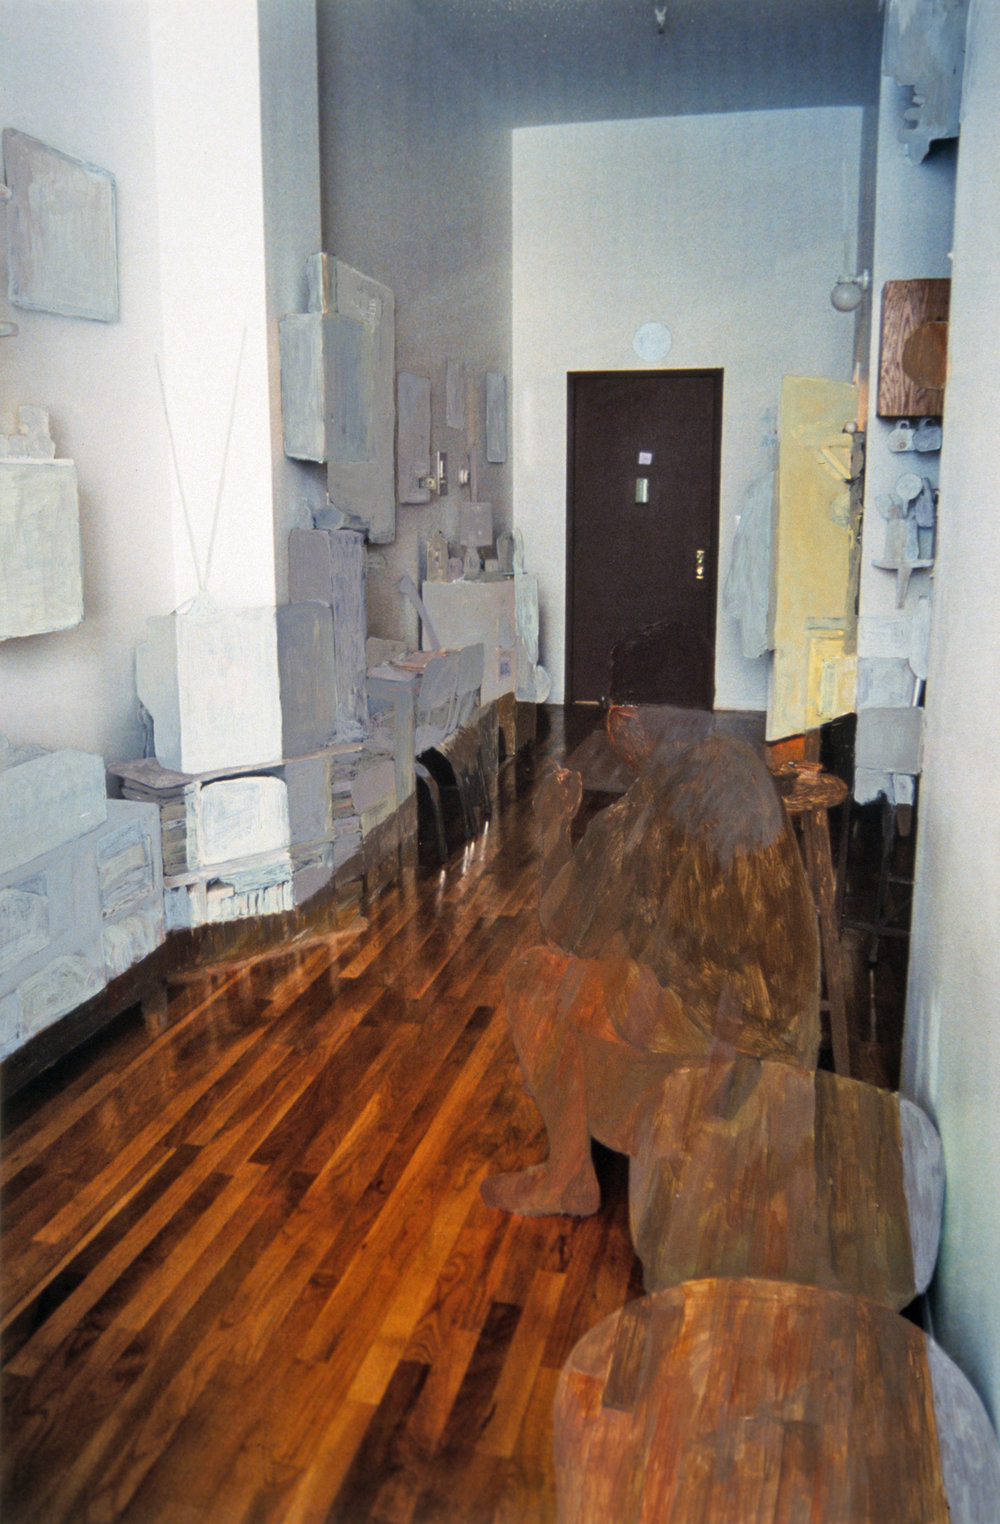 15 Lawton Street, #30, living room